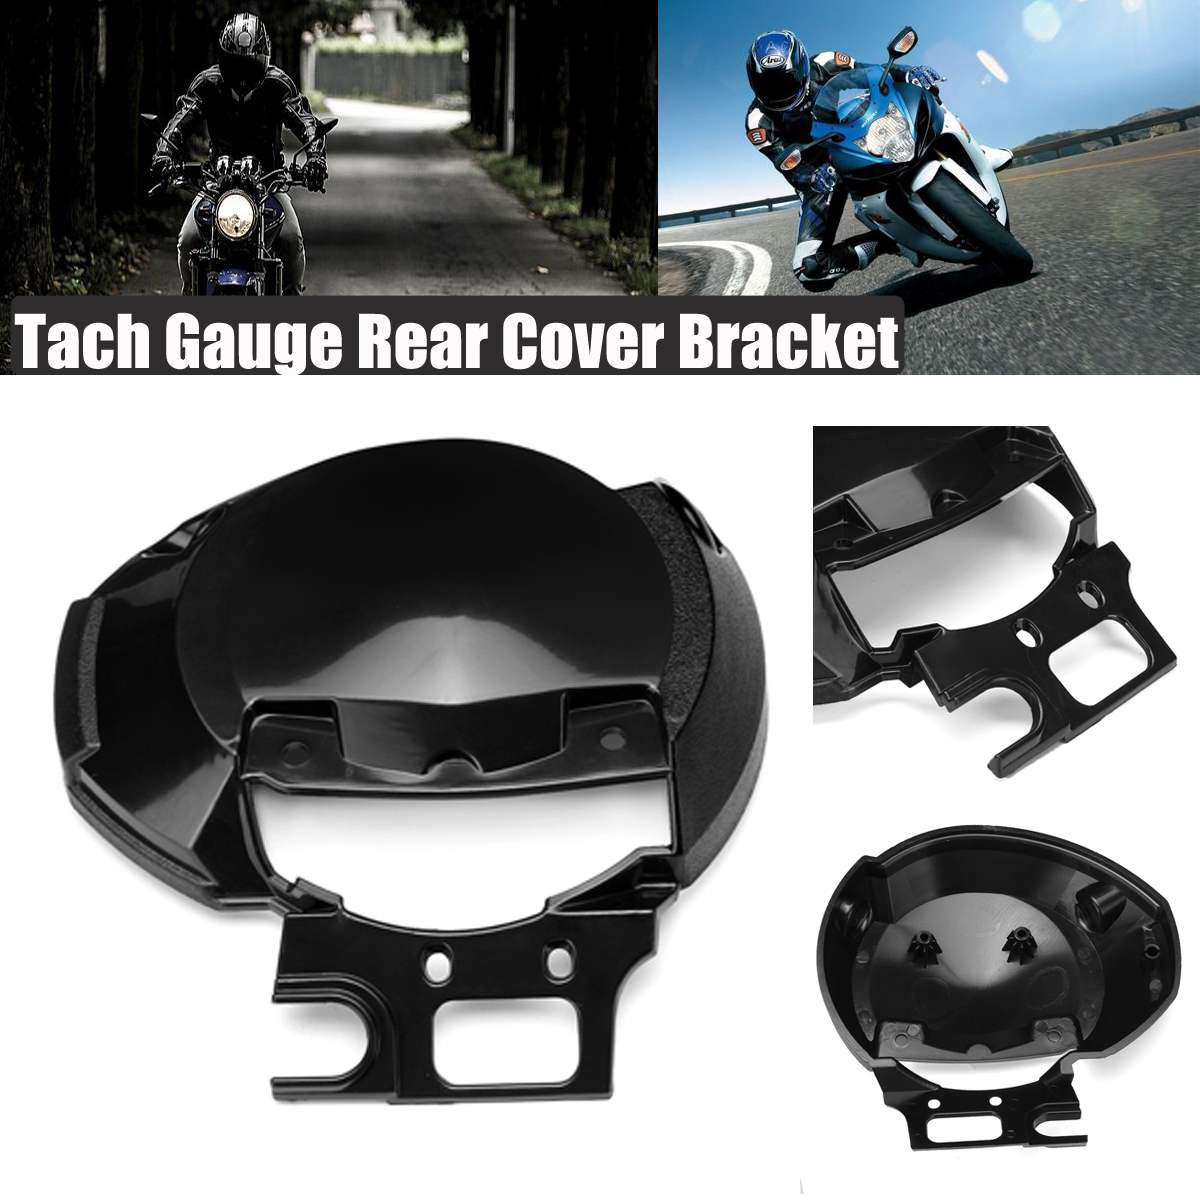 Motorcycle Bottom Speed Tach Gauge Rear Back Cover Bracket Headlight for Yamaha FZ6 FZ6N 2004 2005 2006